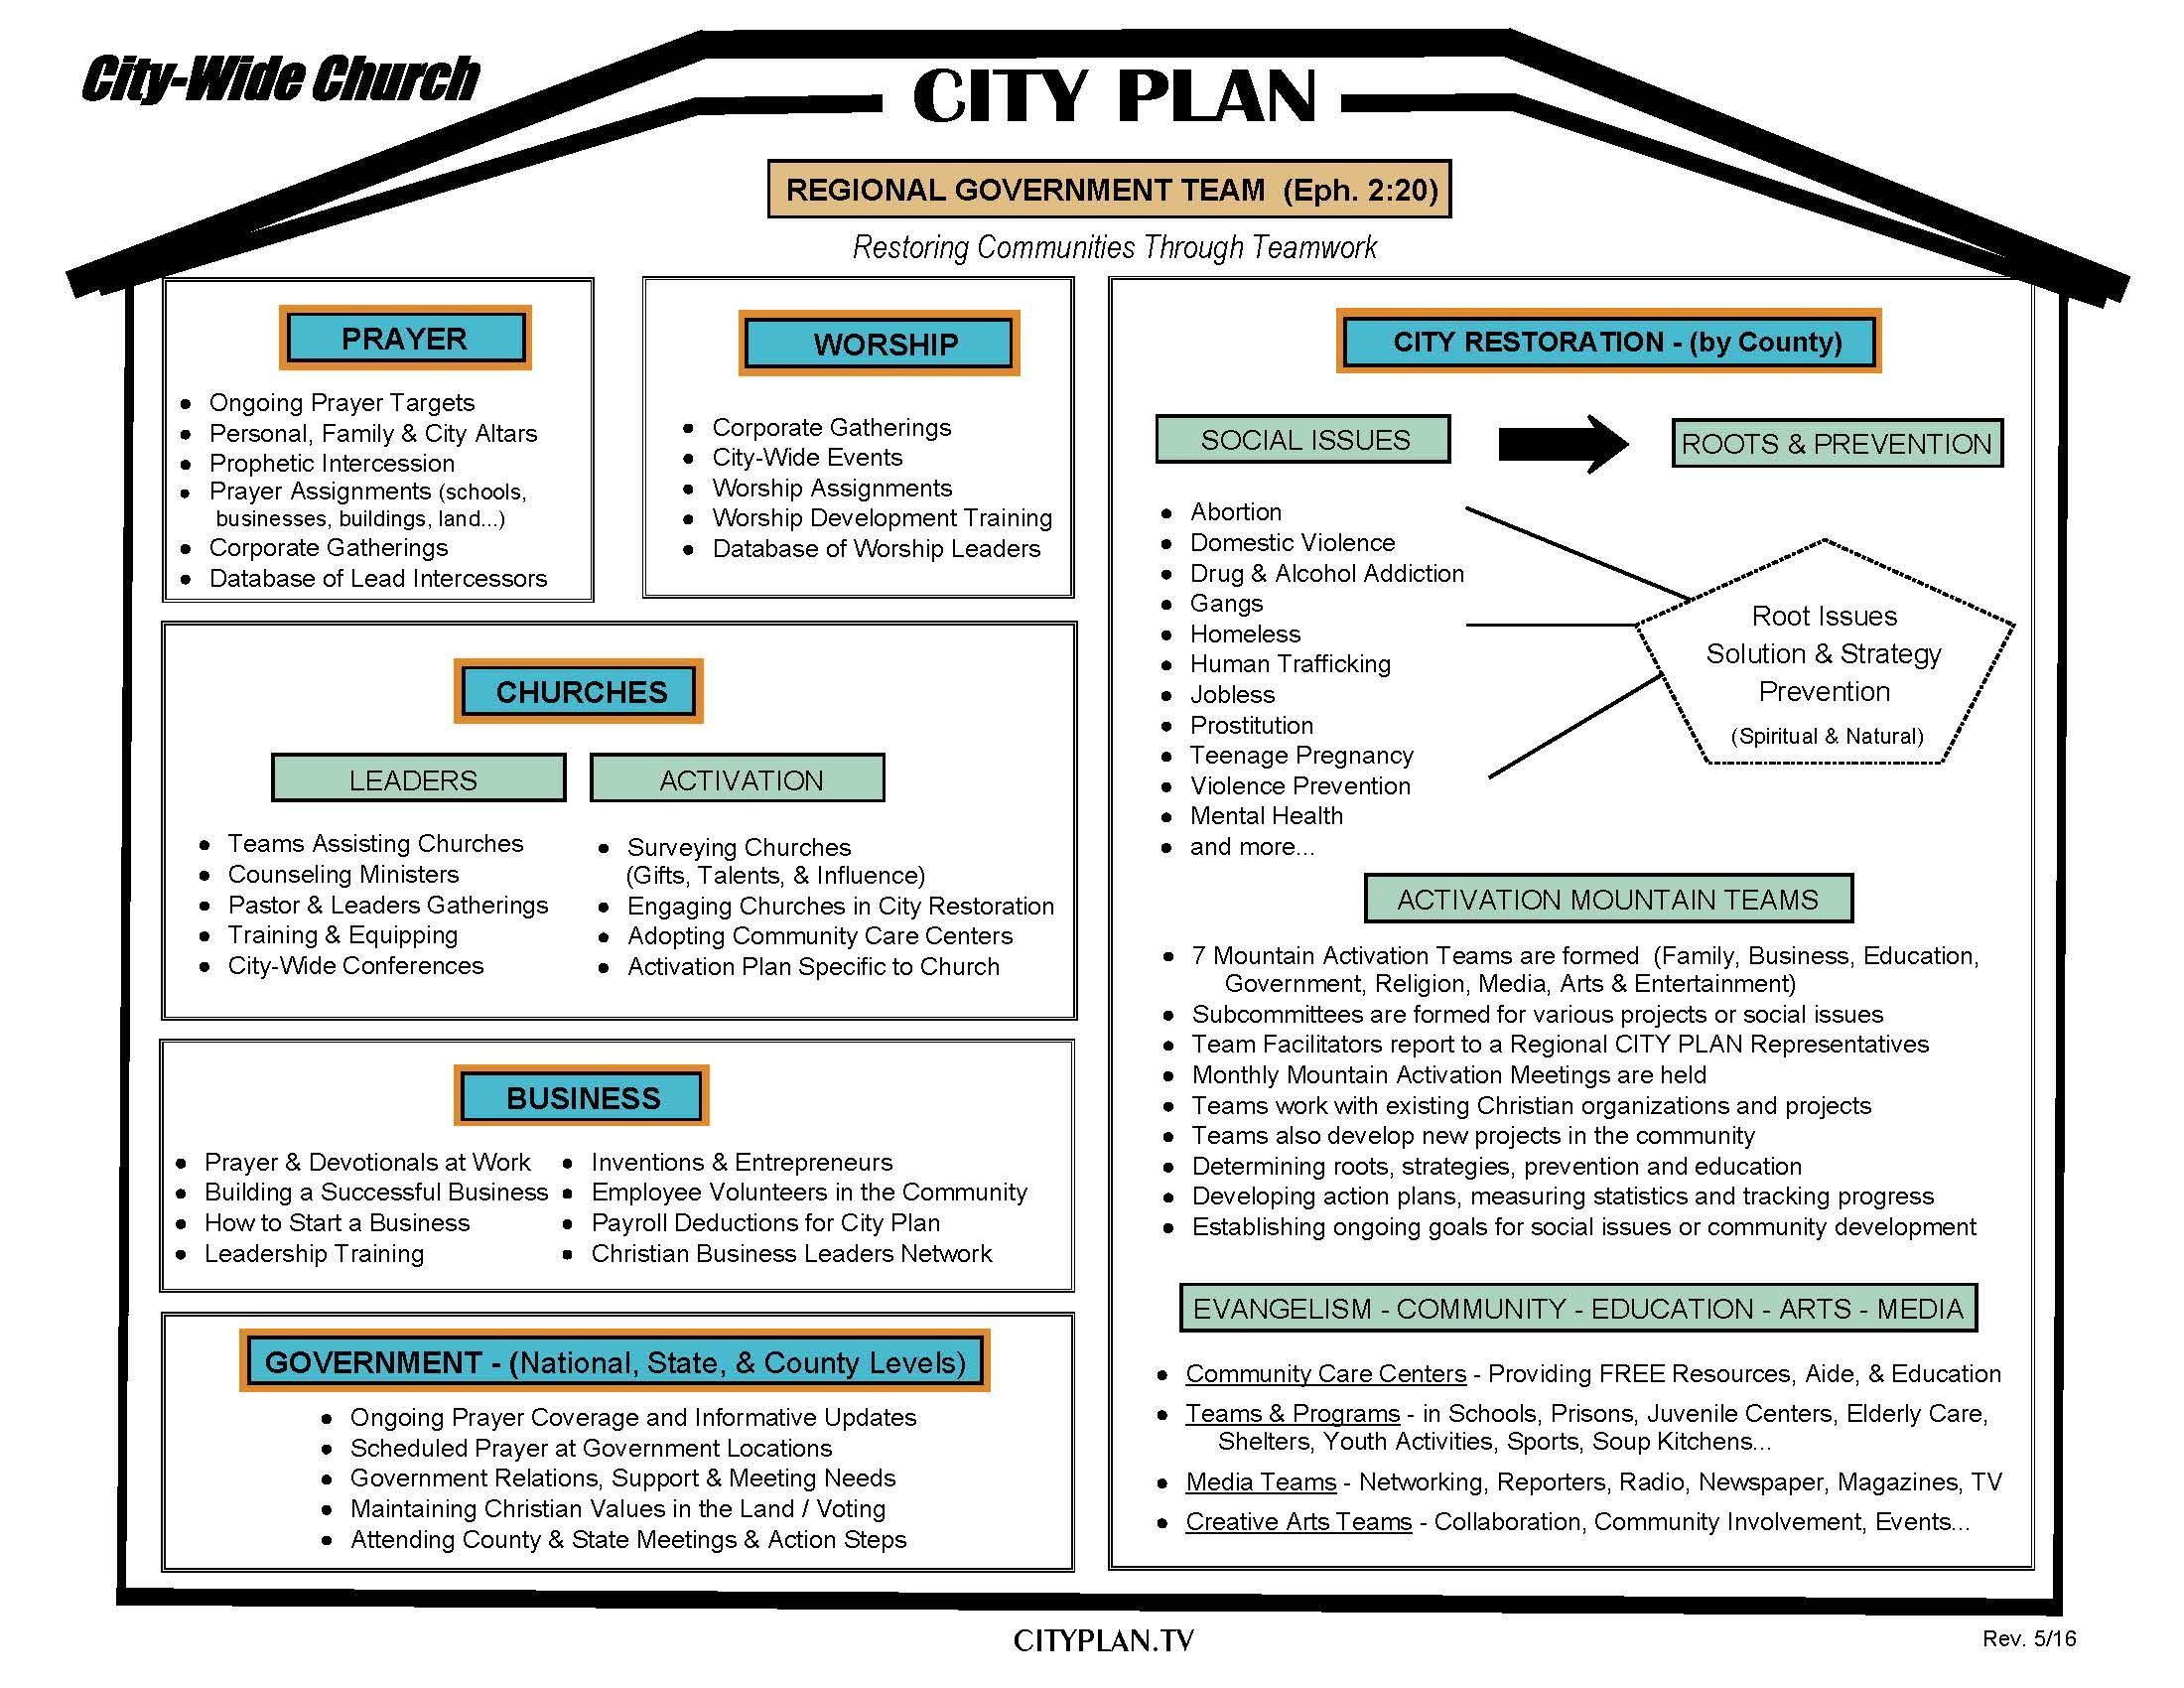 CITY PLAN MODEL 1